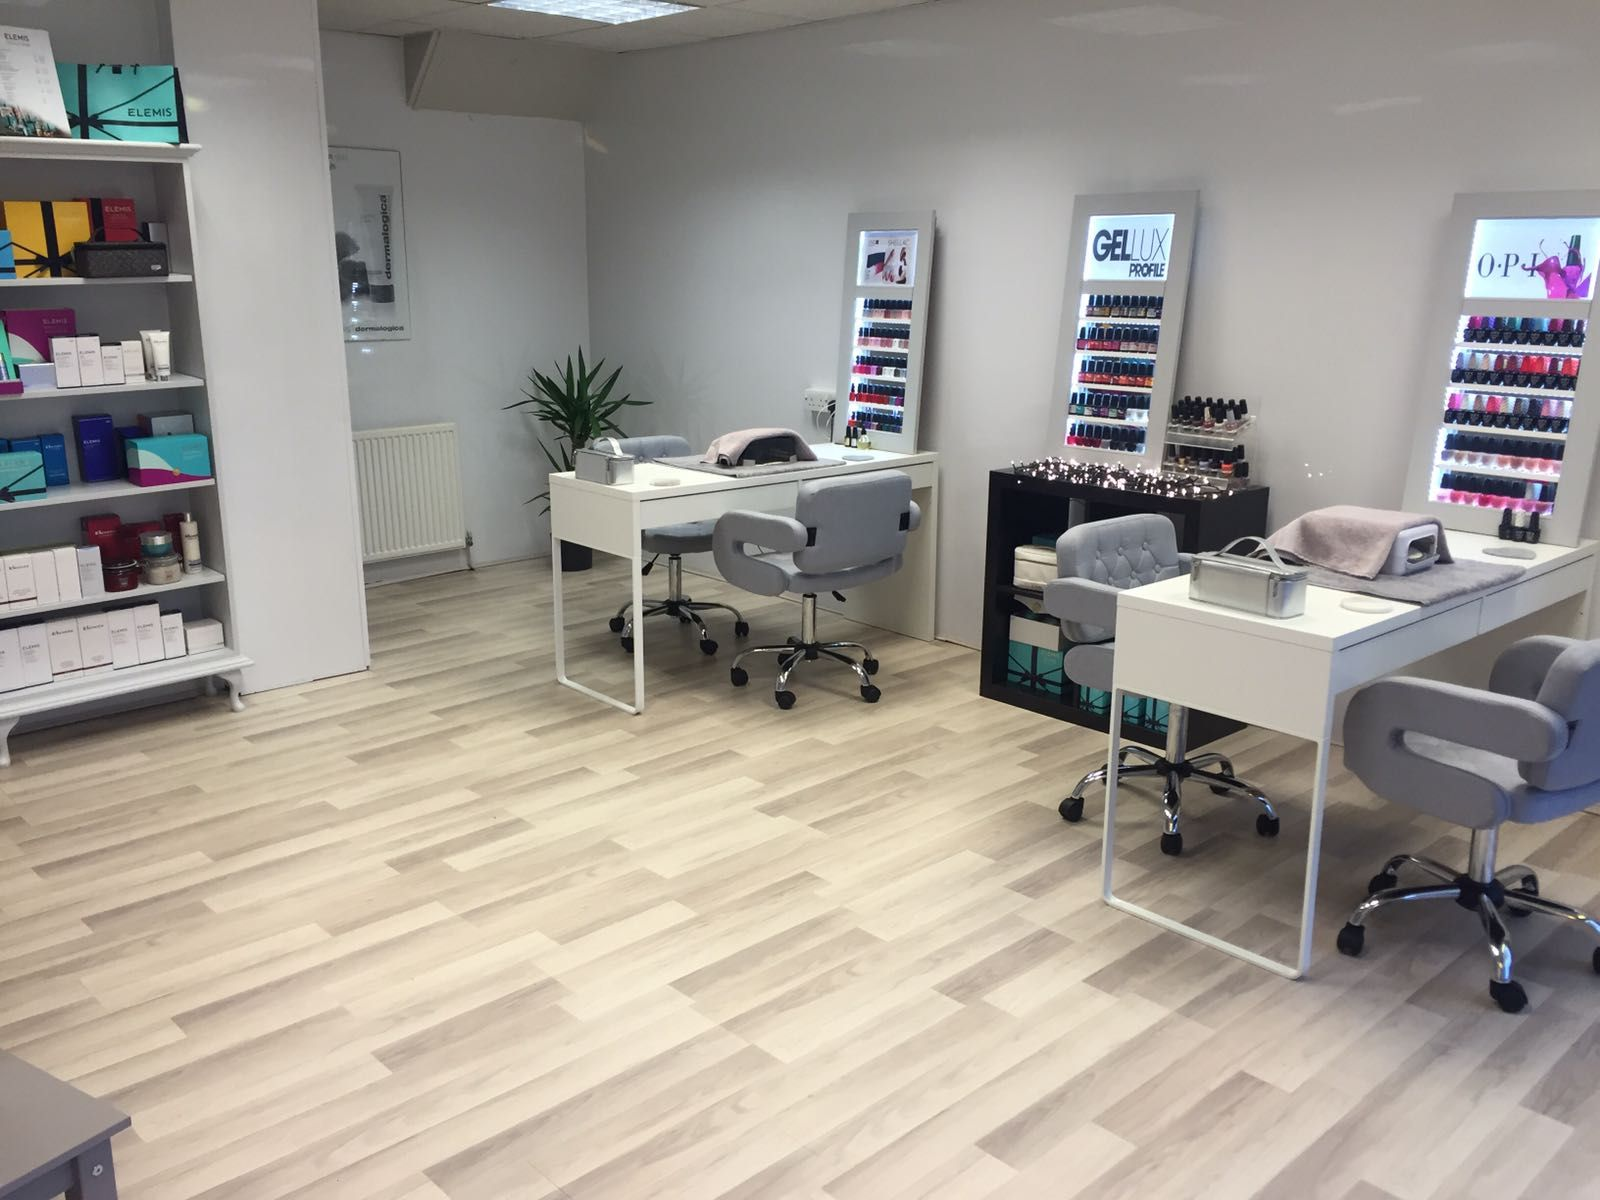 Peppermint salon Sheffield UK Nail salons interior design